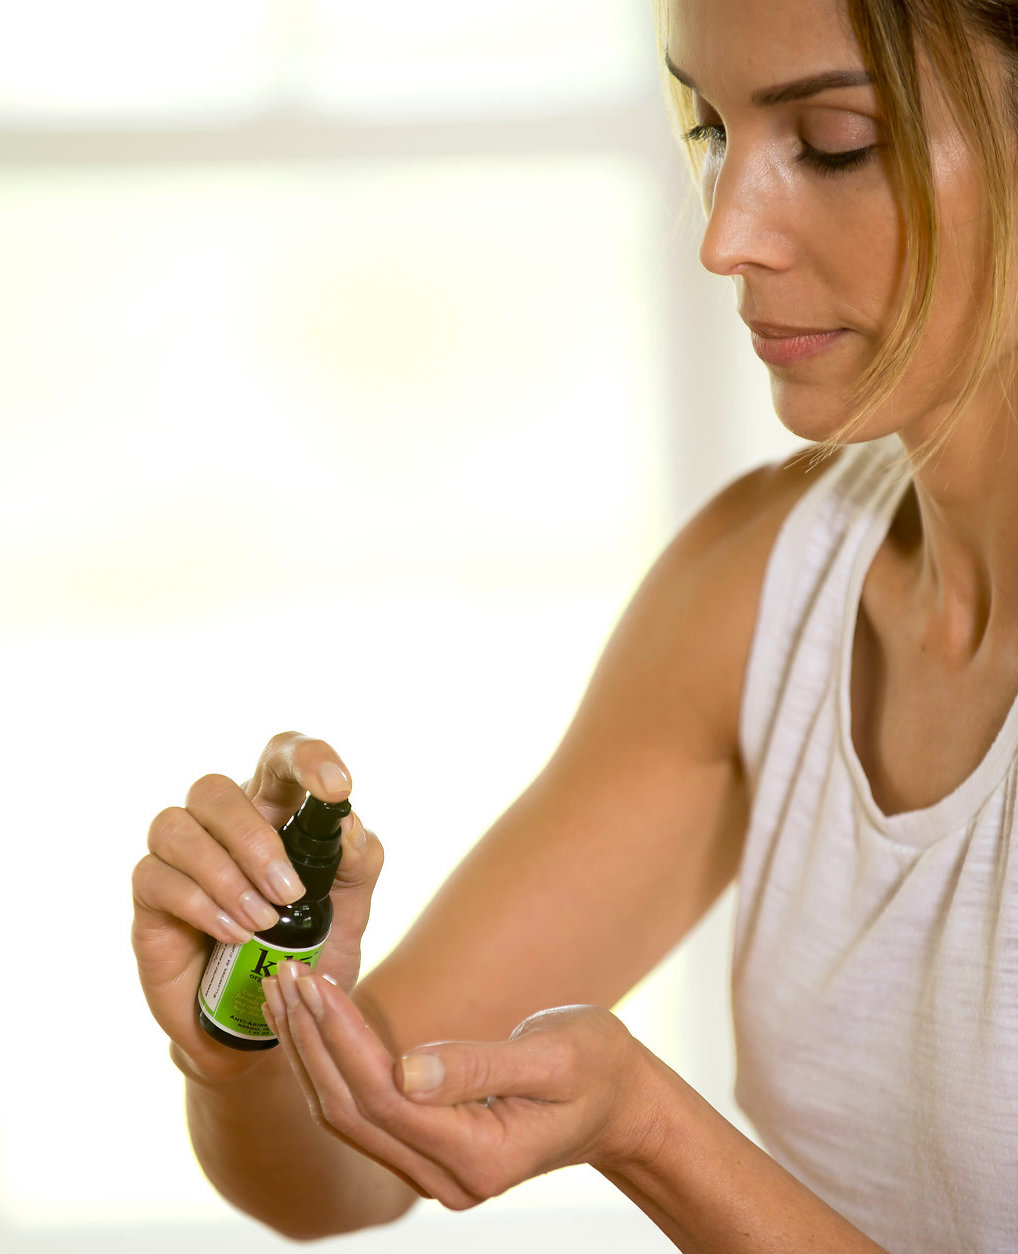 Tan model pumping Klō Organic Beauty serum into her hands.